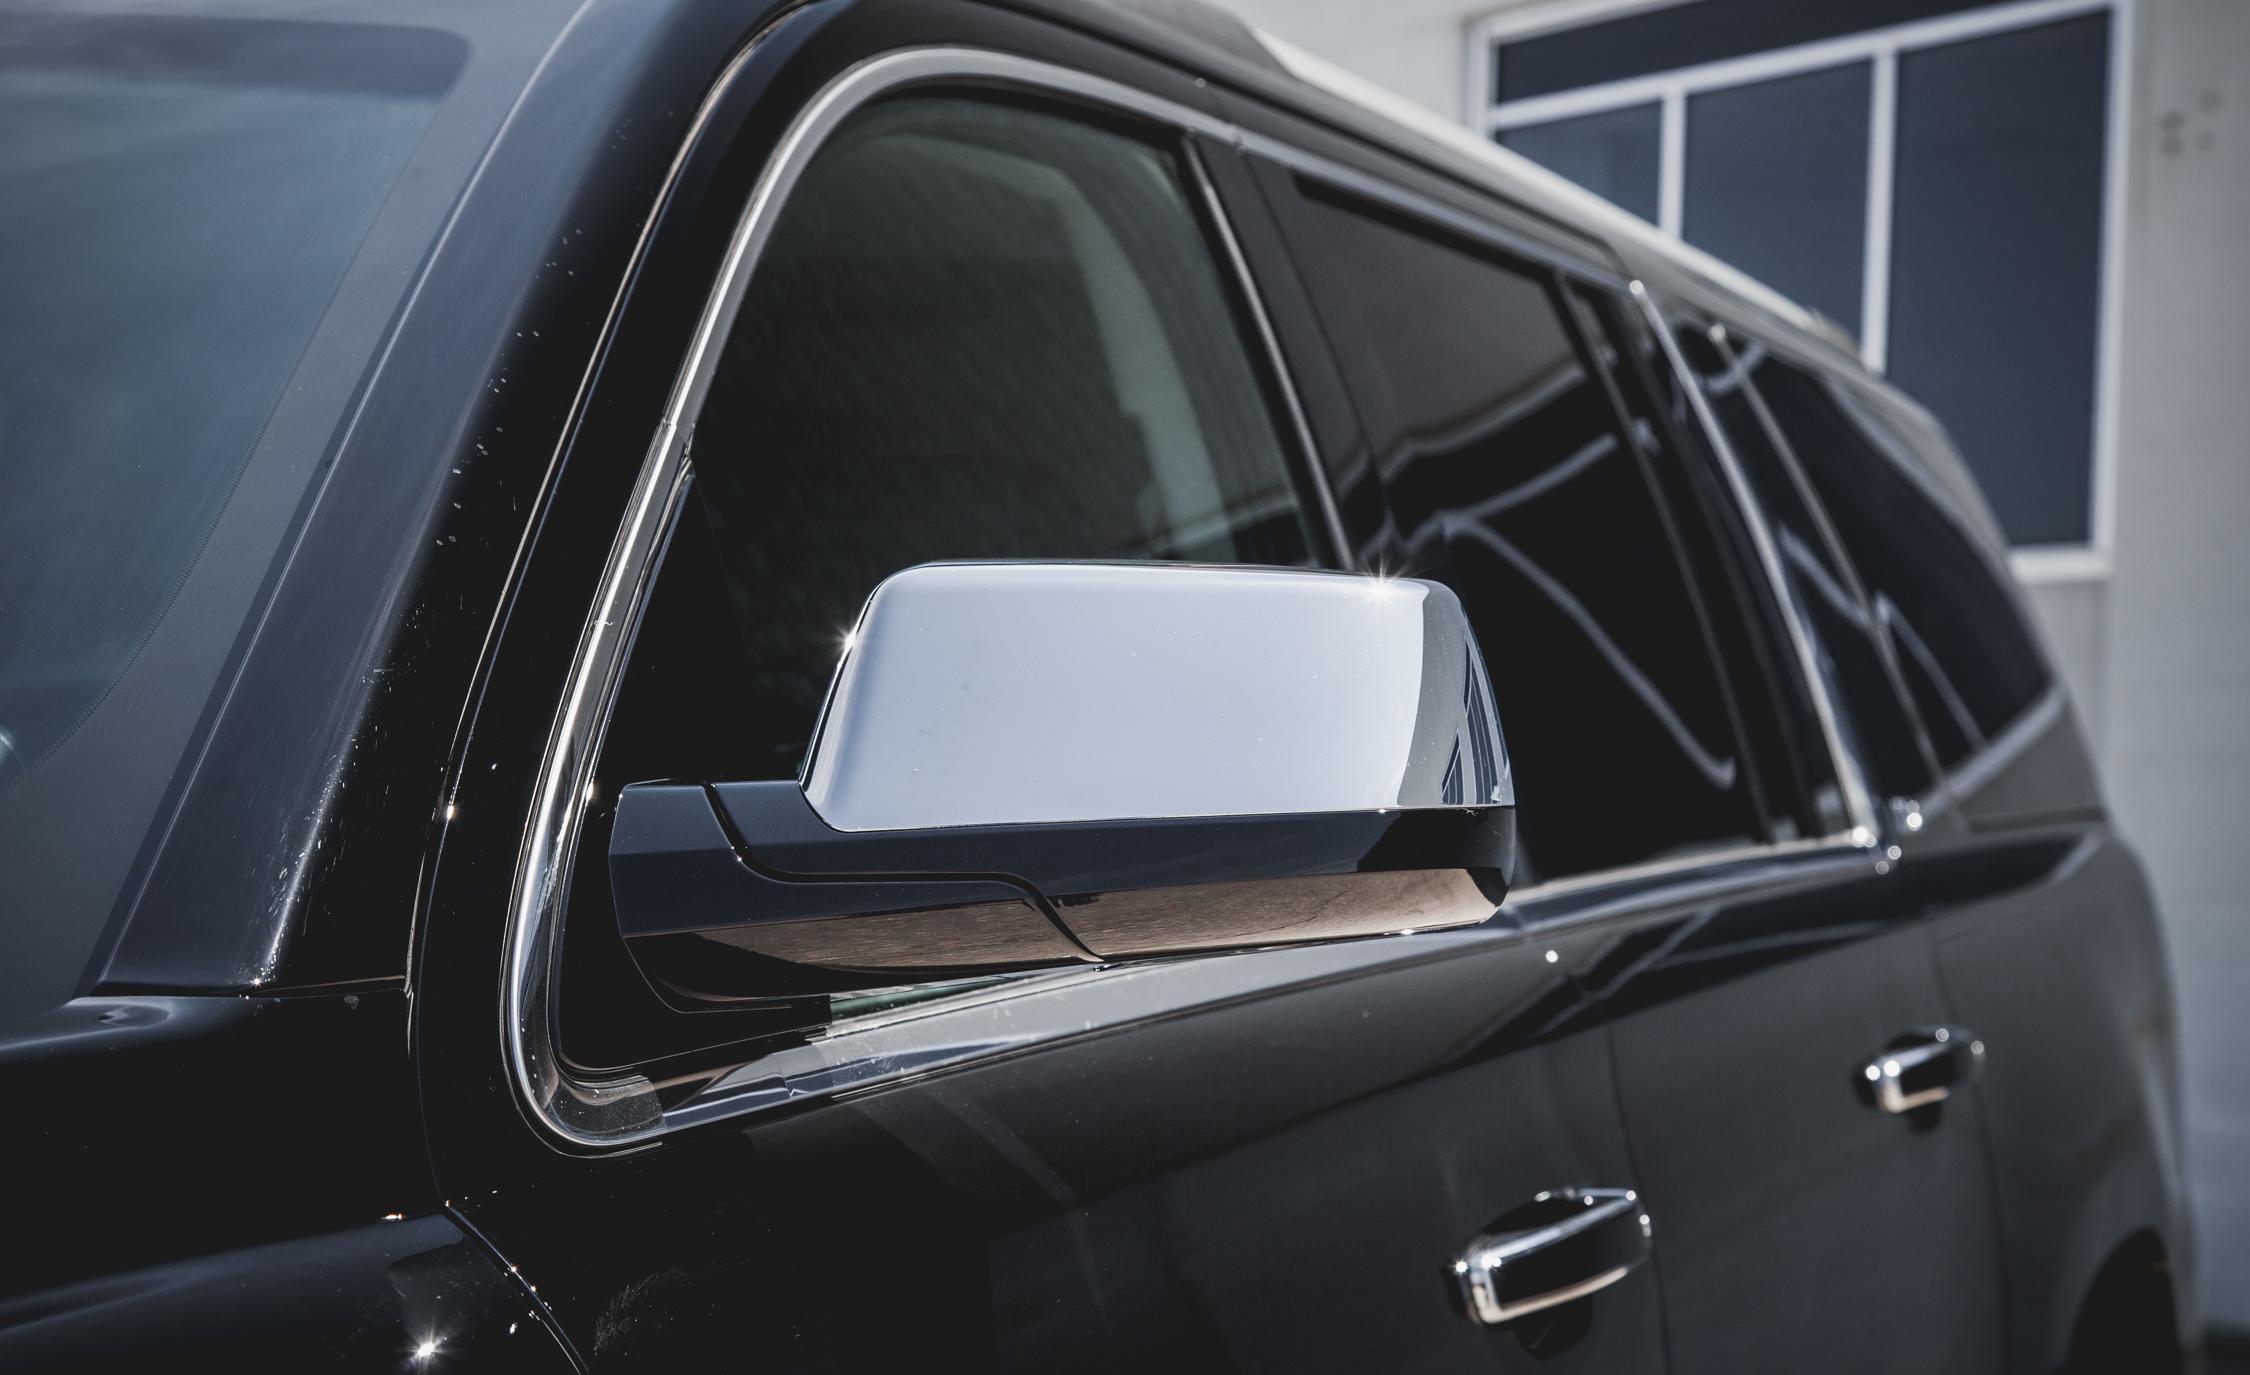 2015 Chevrolet Suburban LTZ Exterior Side Mirror